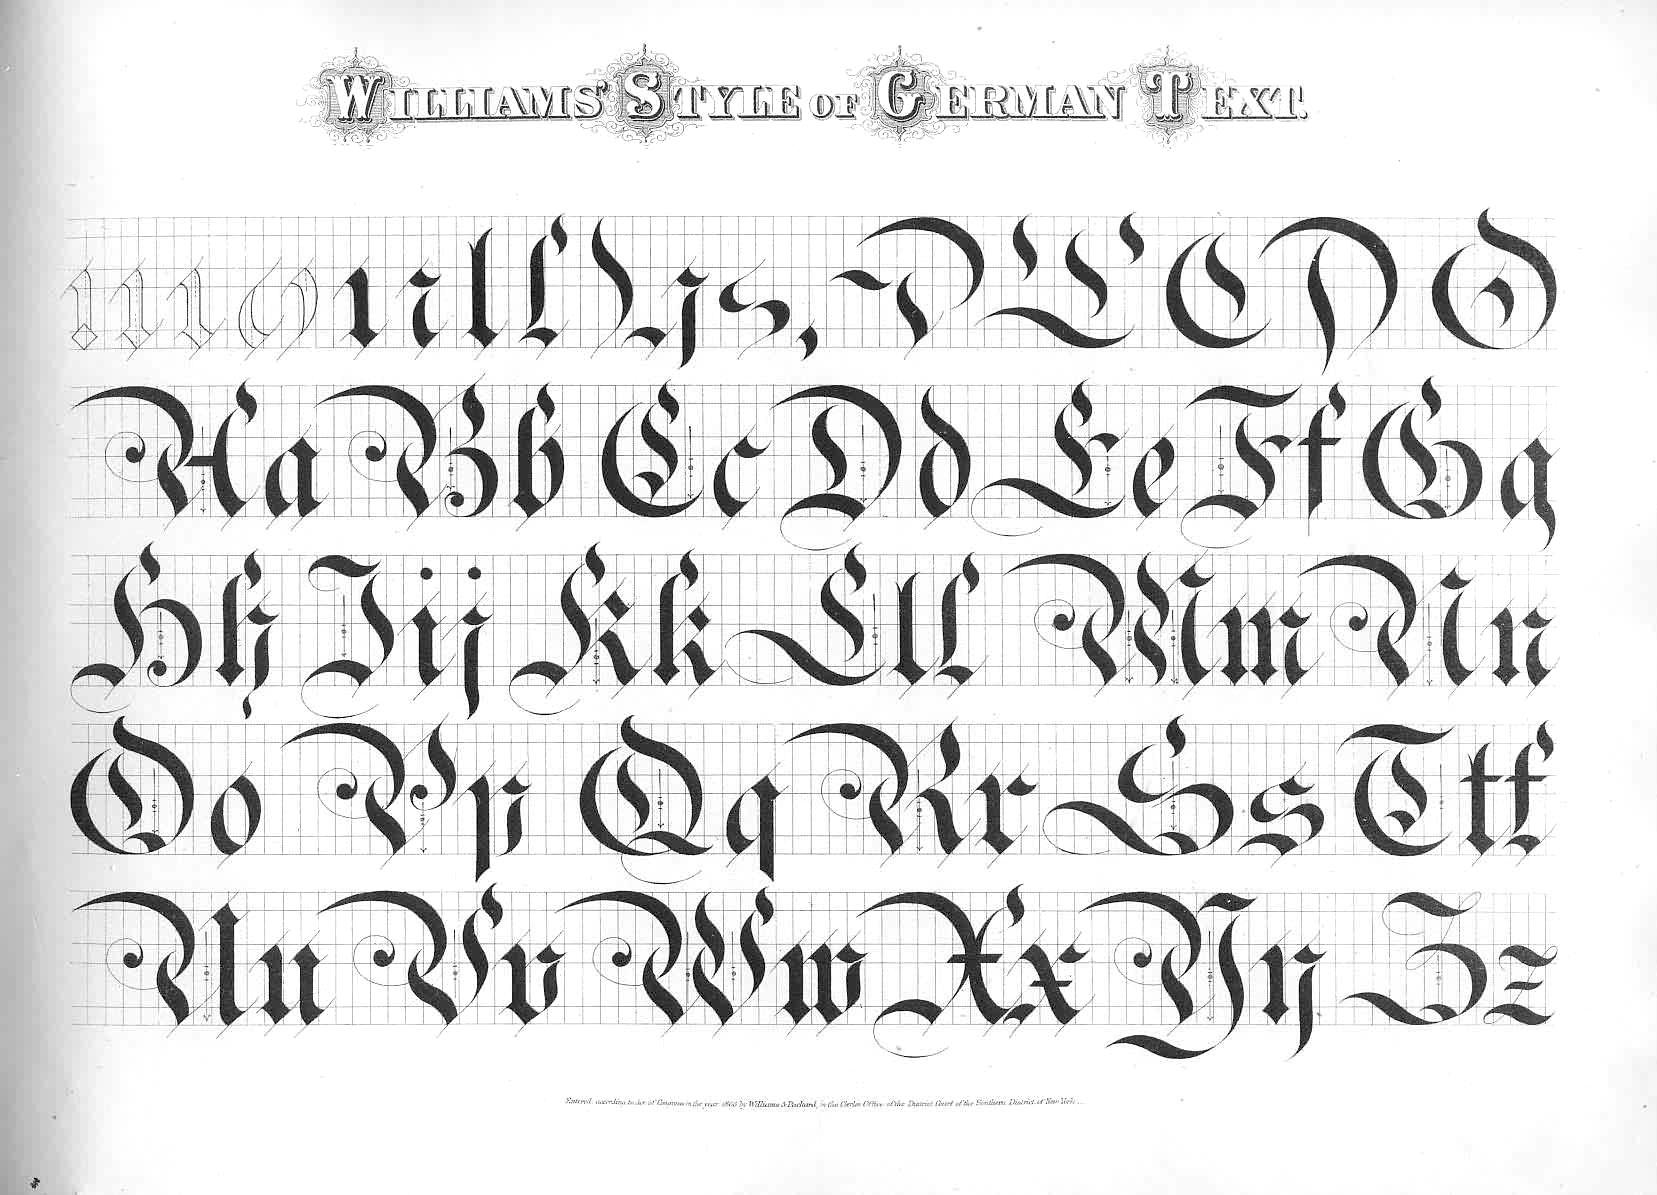 Penmanship German Font And Old English